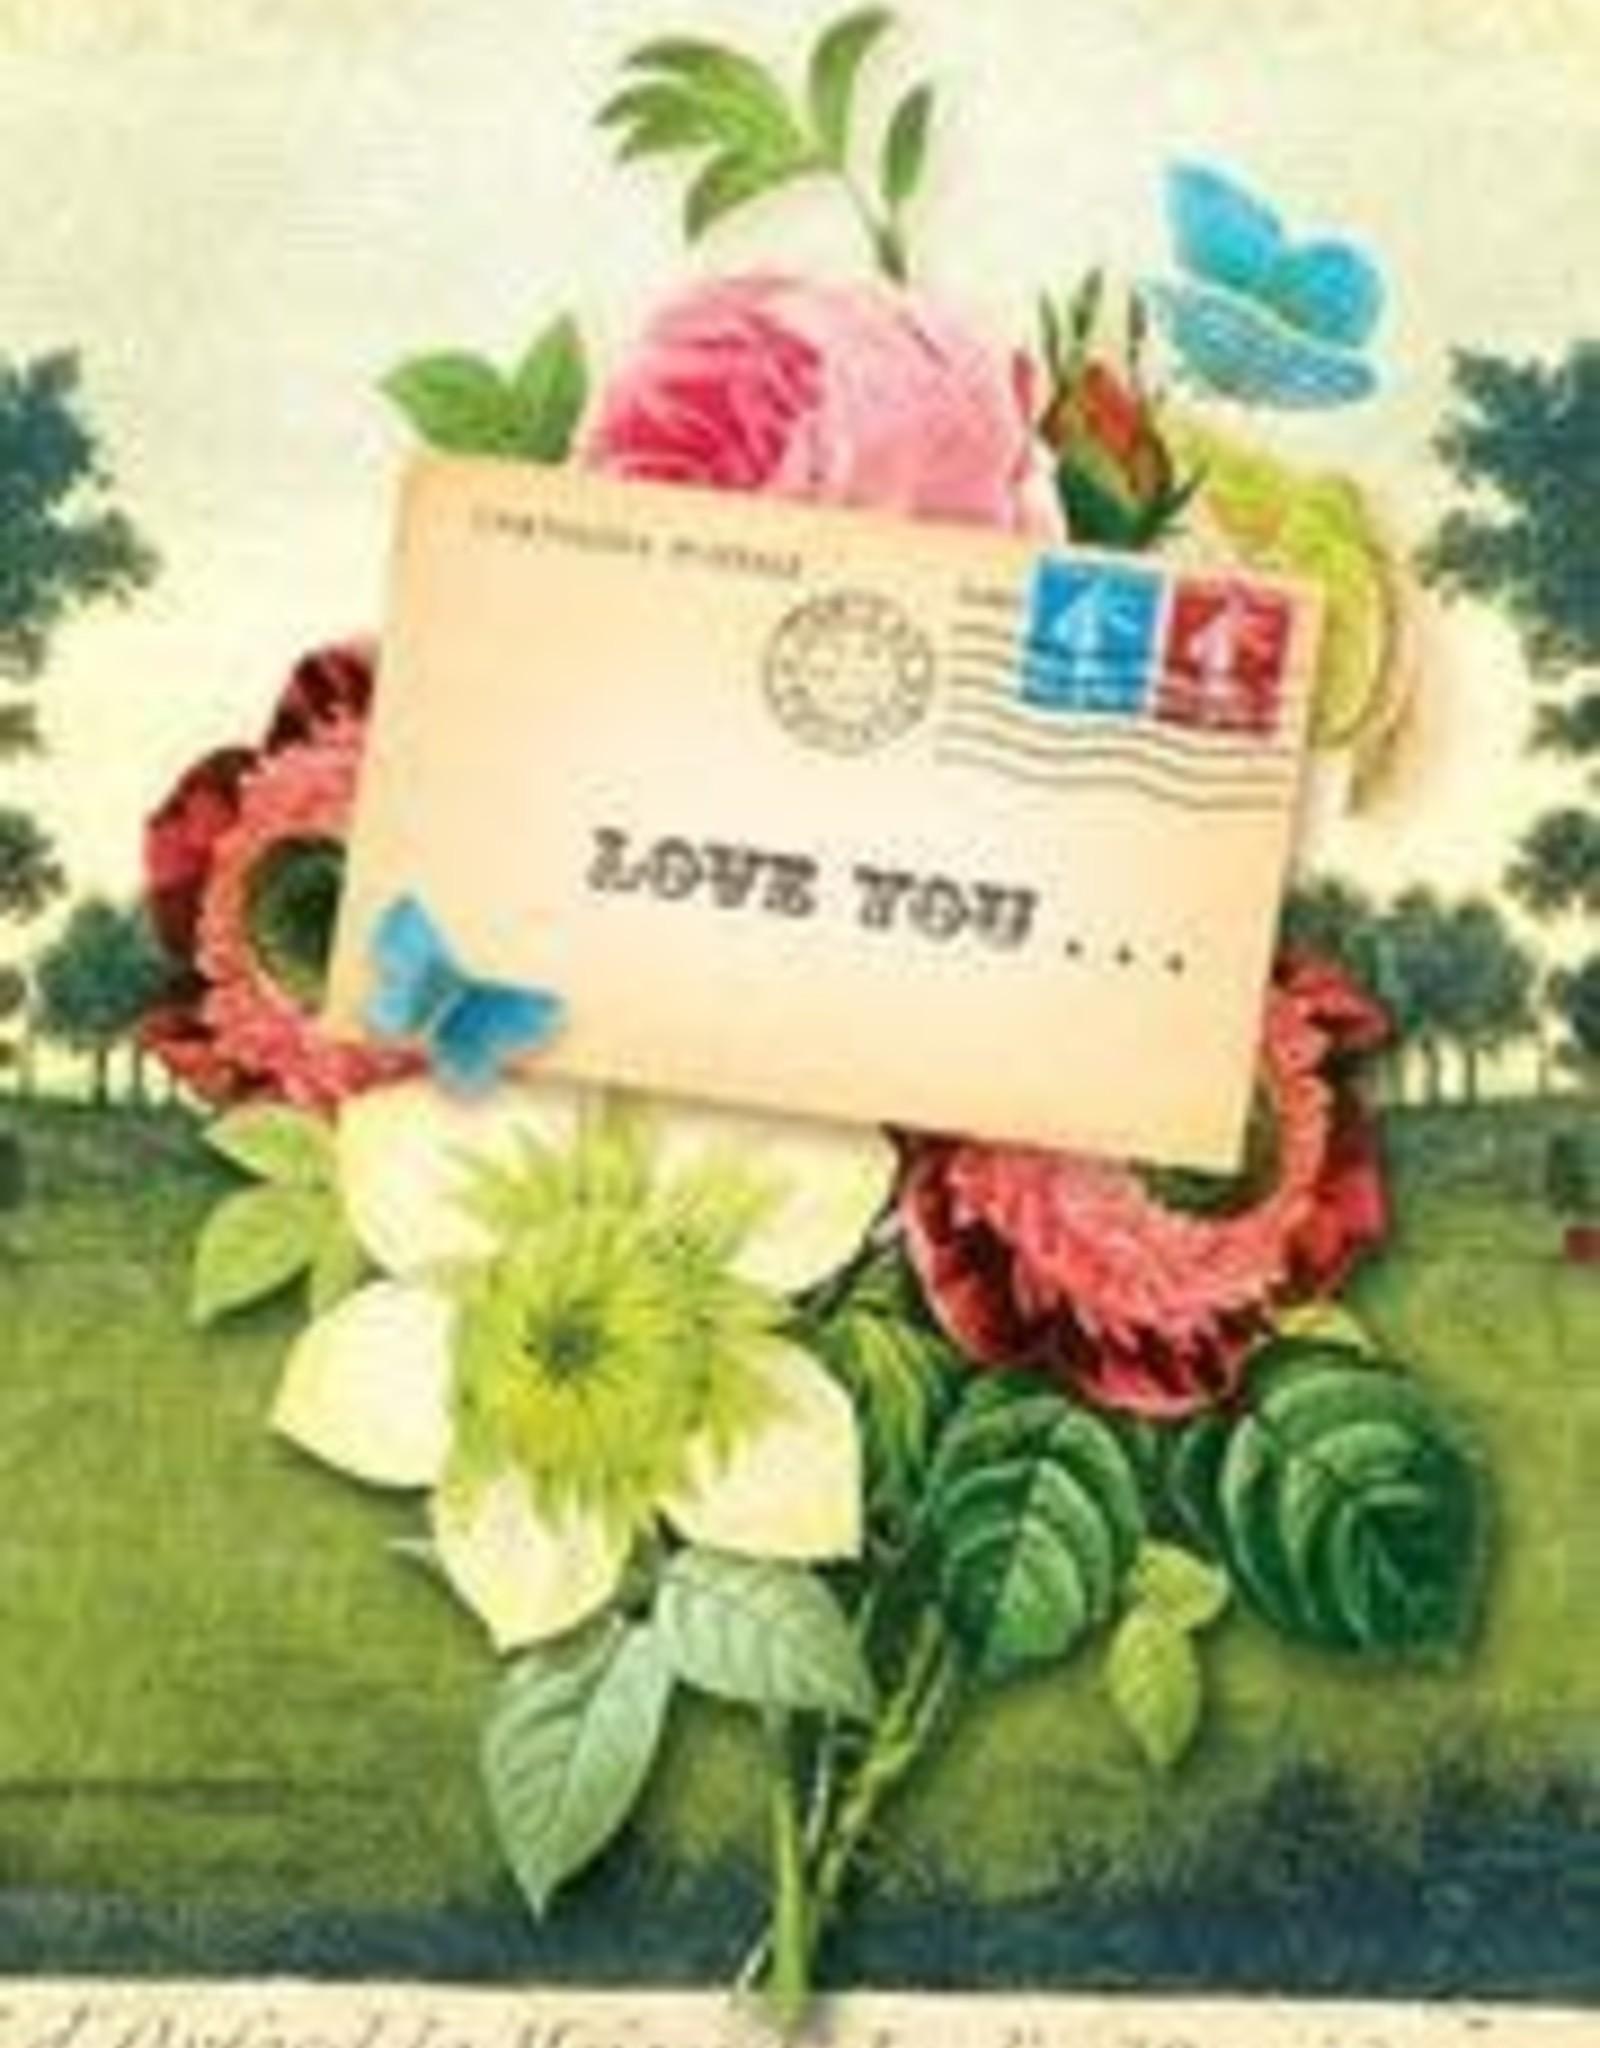 CARD-LOVE YOU